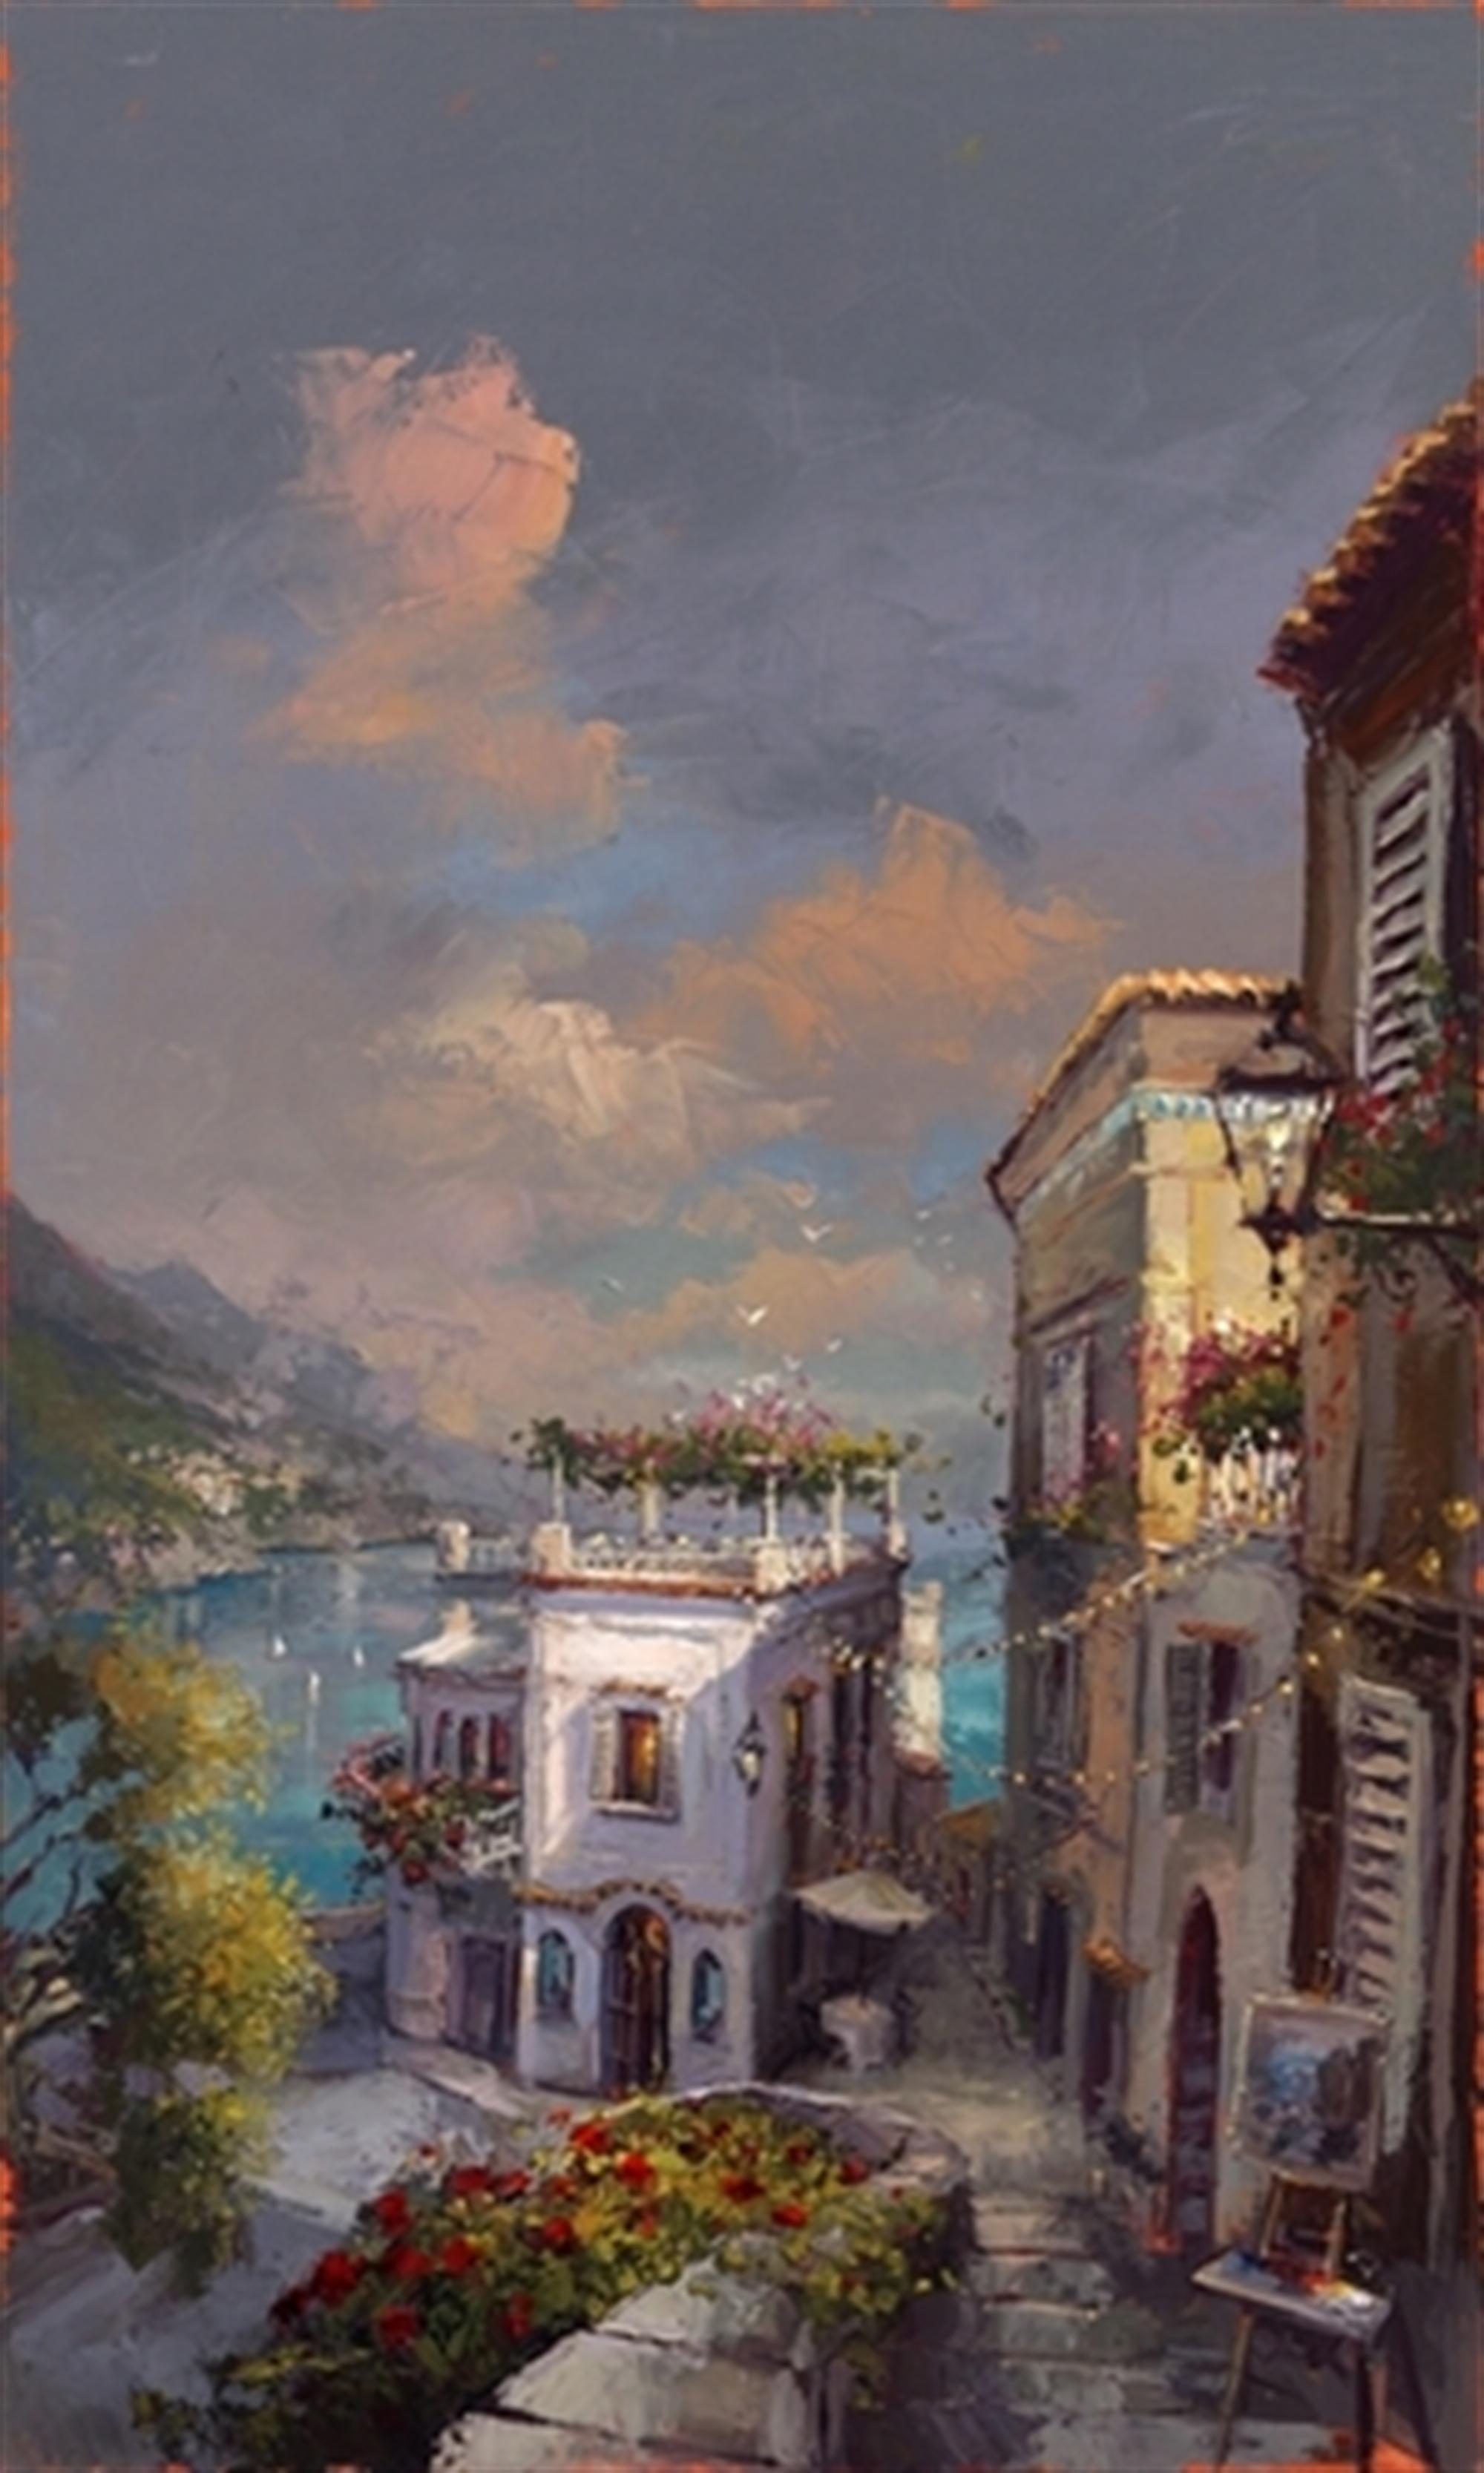 Amalfi Daybreak by Steven Quartly